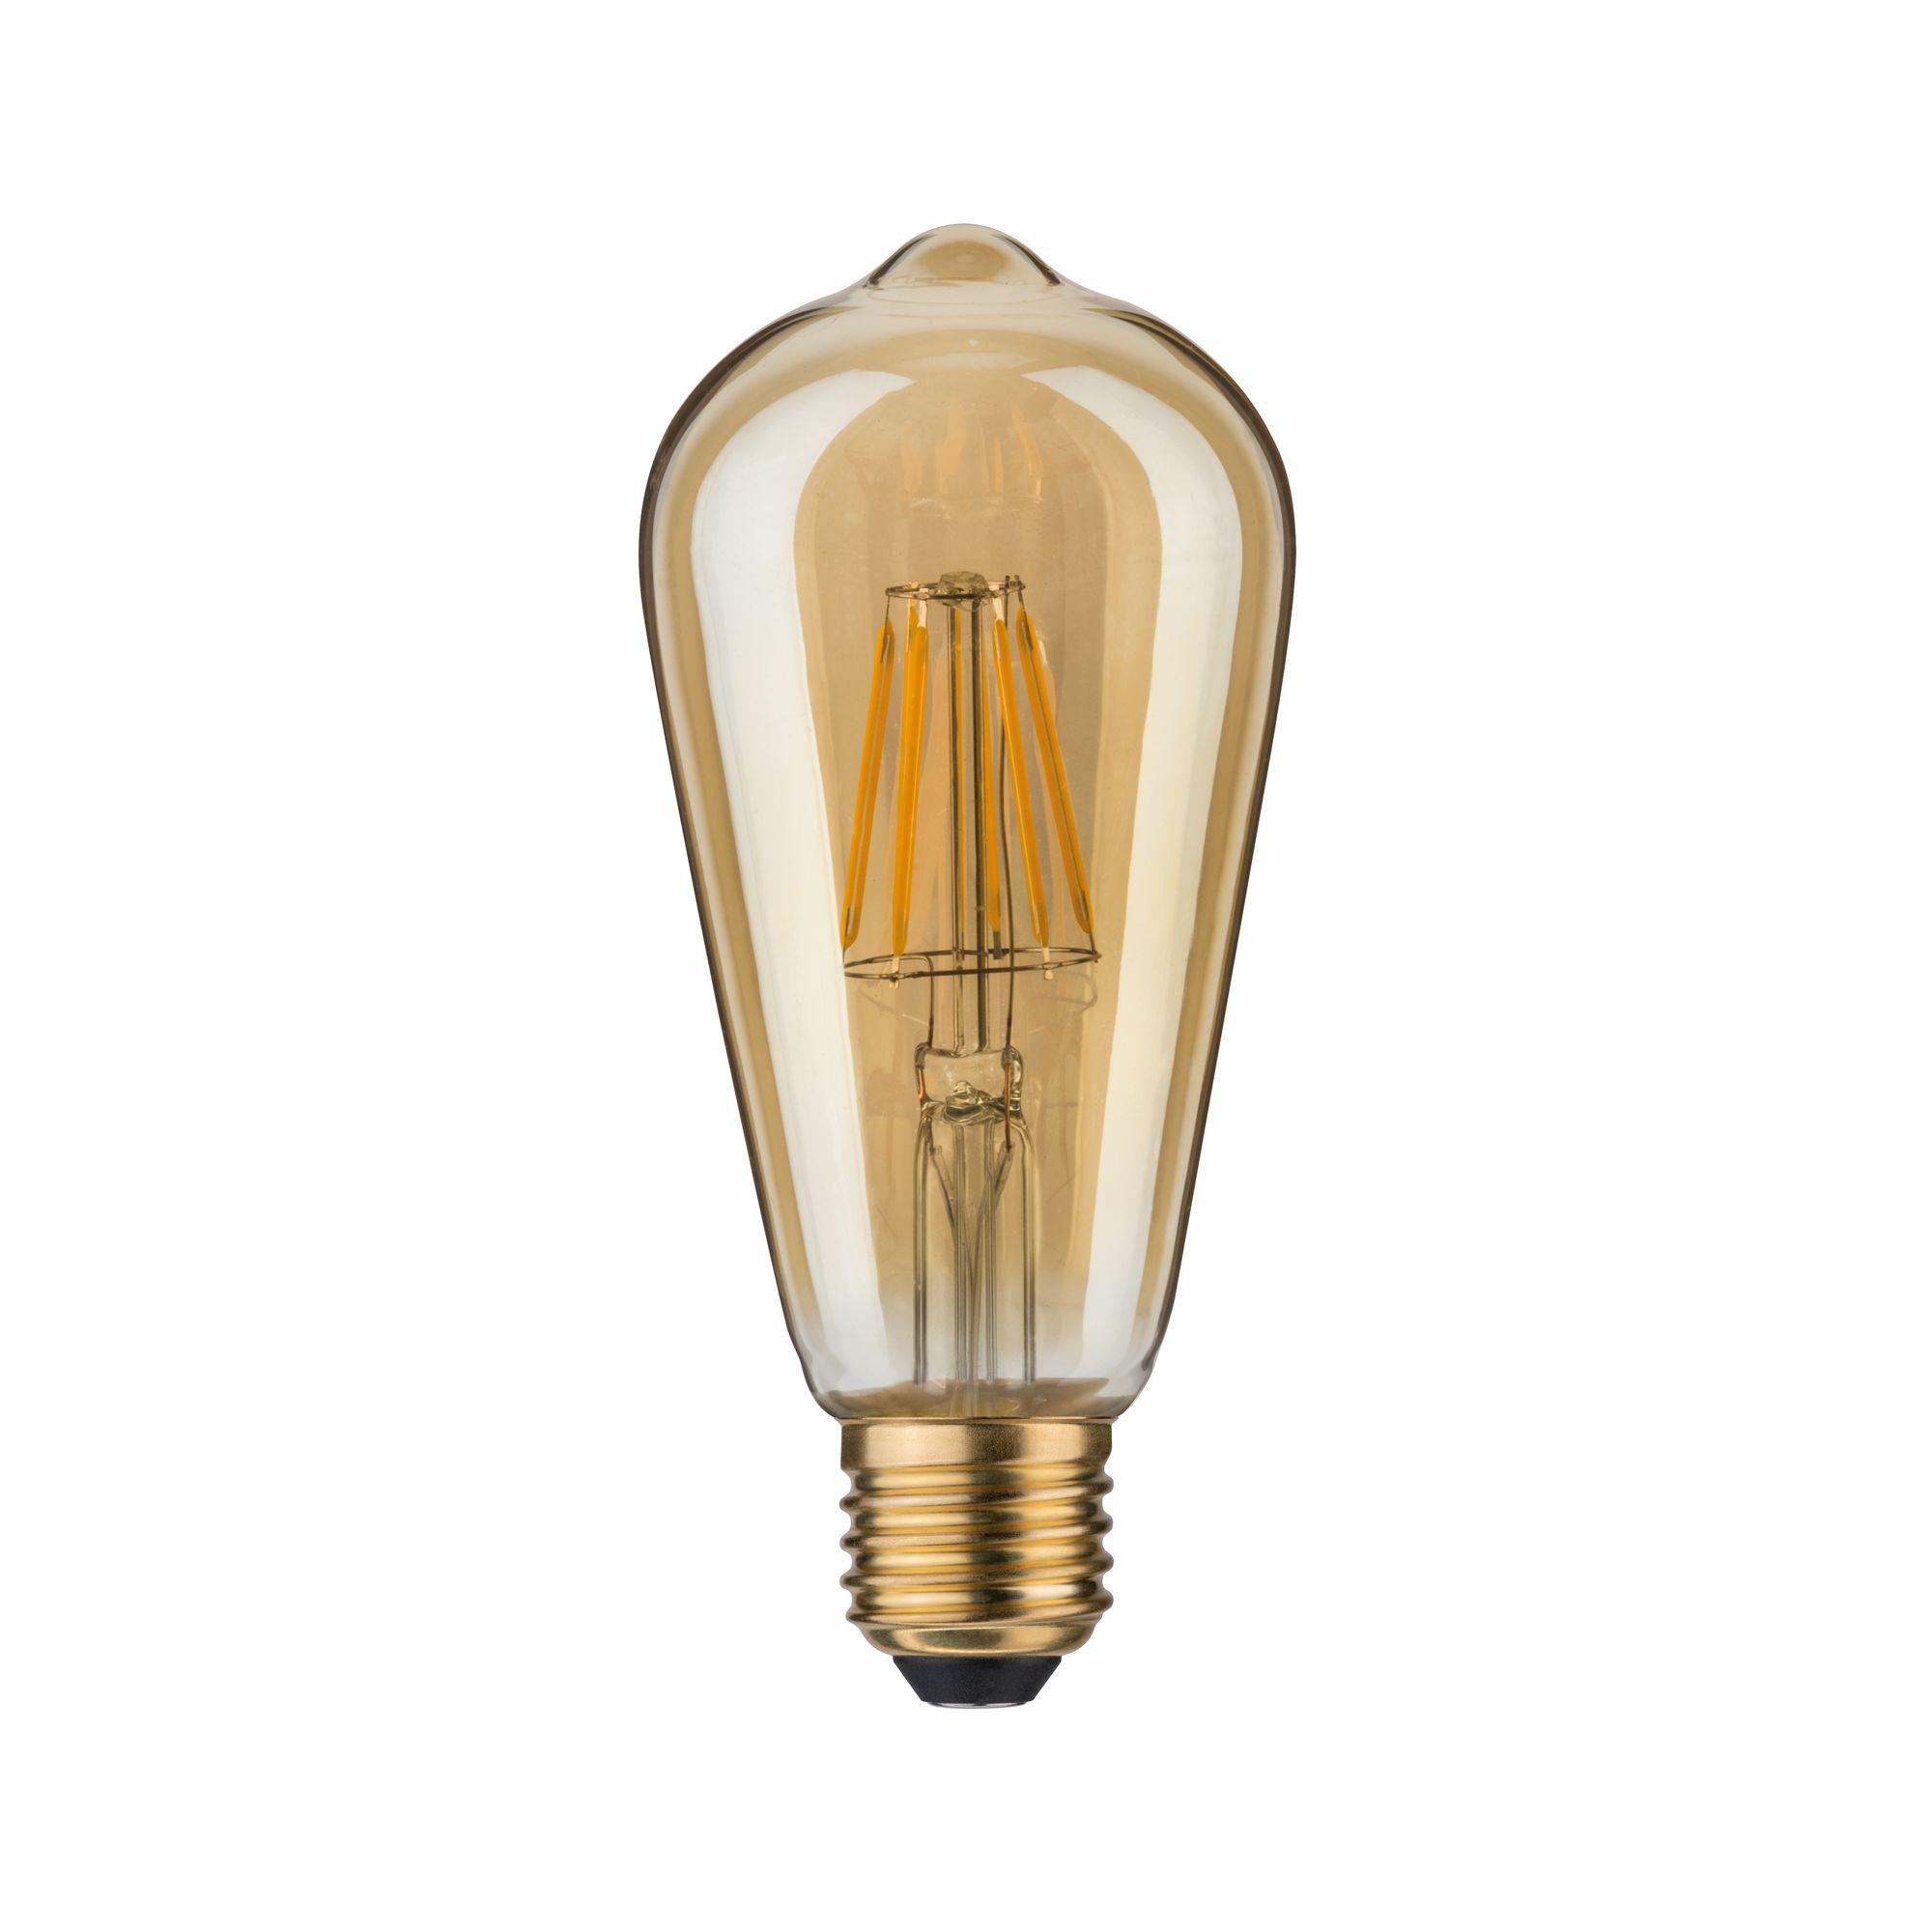 Лампа филаментная Paulmann Vintage ST64 7.5Вт 550лм 2500К E27 230В Золото 28391.